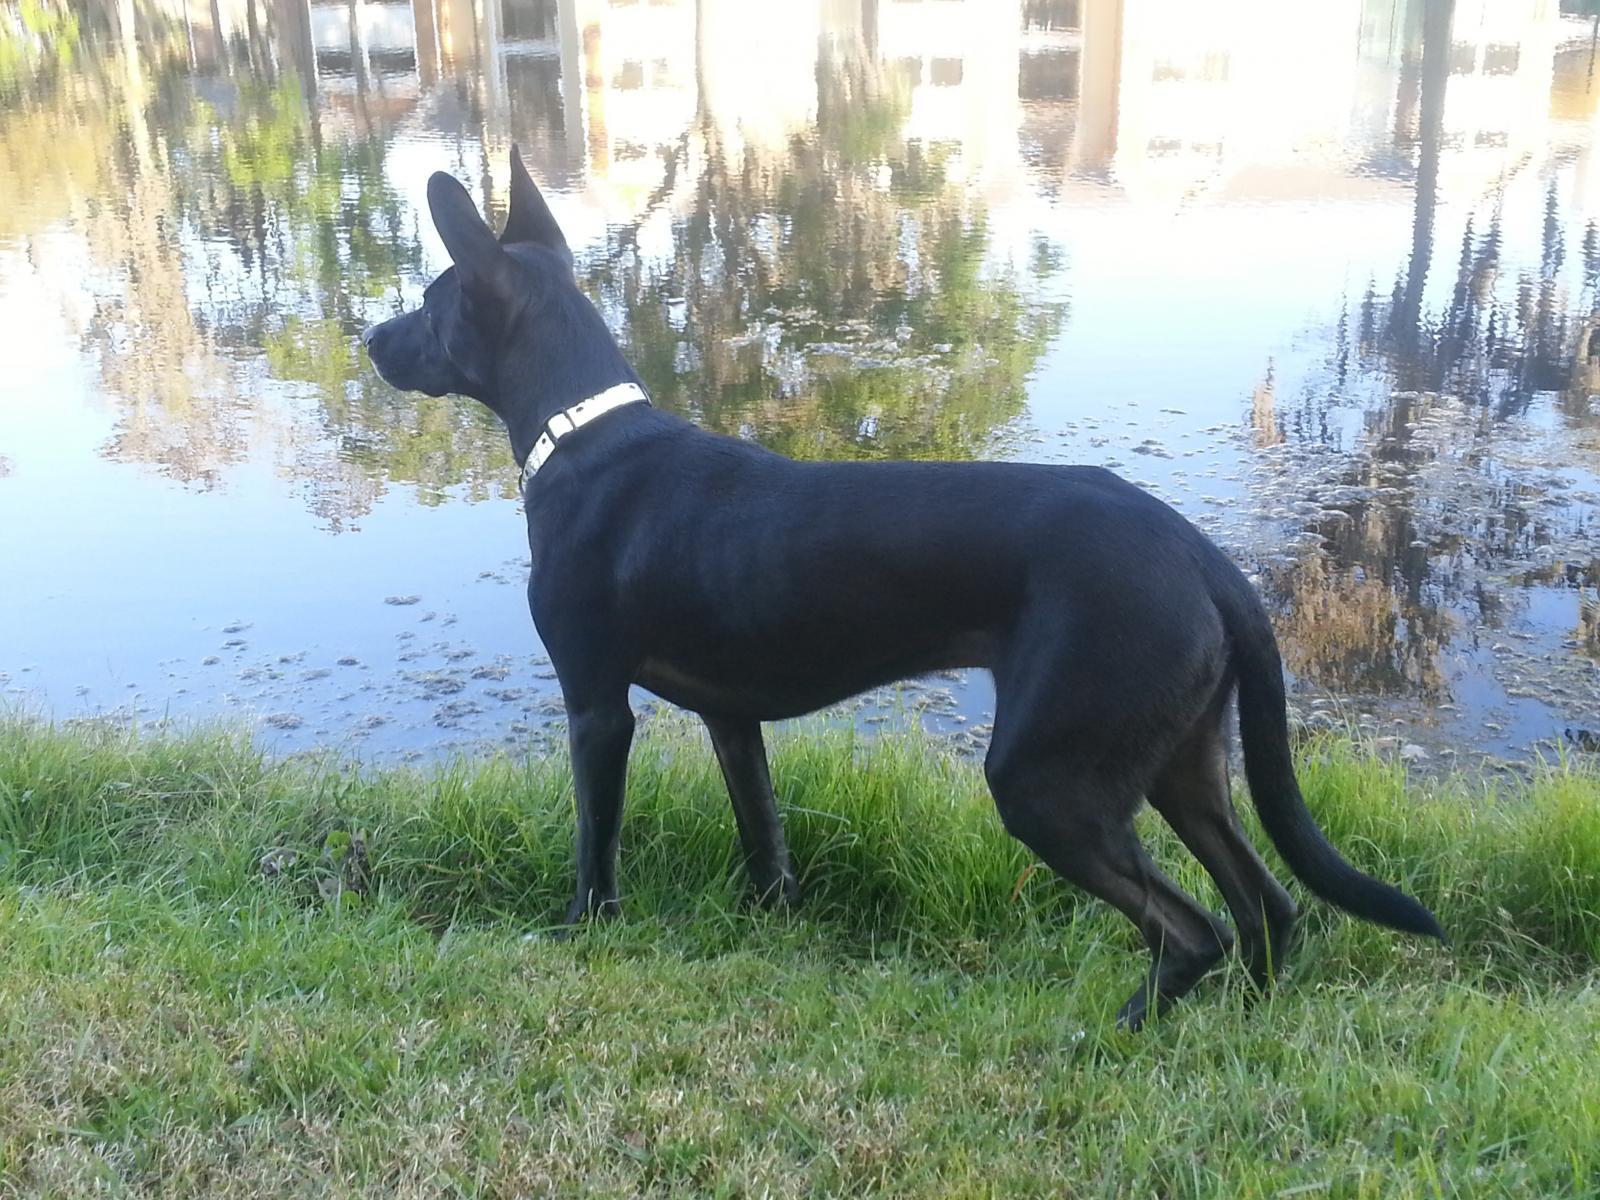 Doberman/German Shepherd Mix? - Doberman Forum : Doberman Breed Dog ...